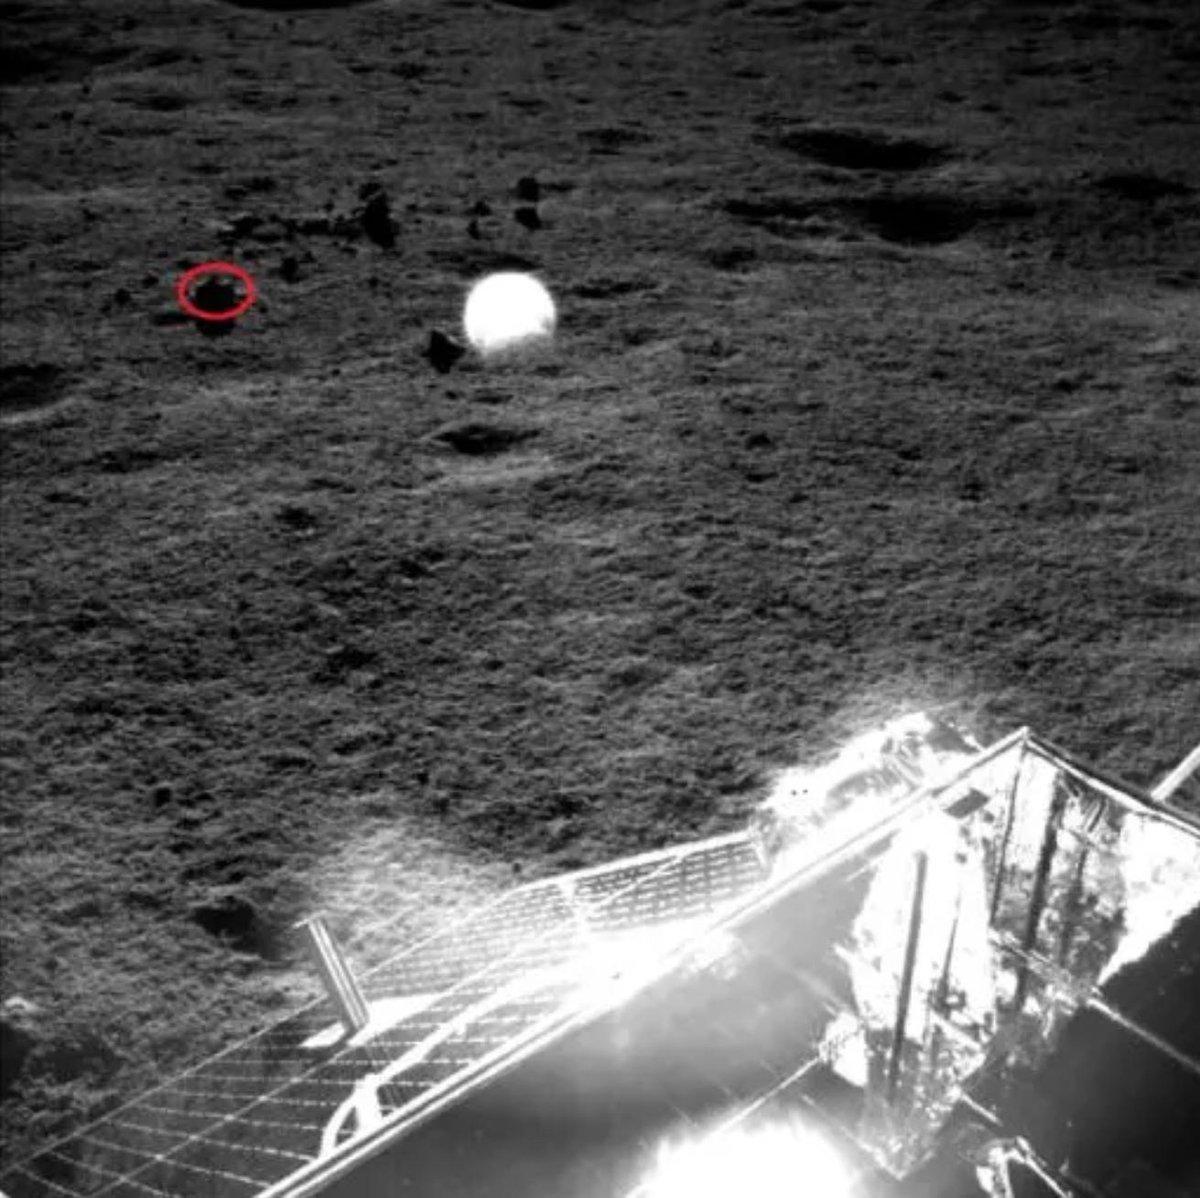 Миссия «Чанъэ-4» — третий лунный день. Ровер «Юйту-2» в поисках… камней - 25